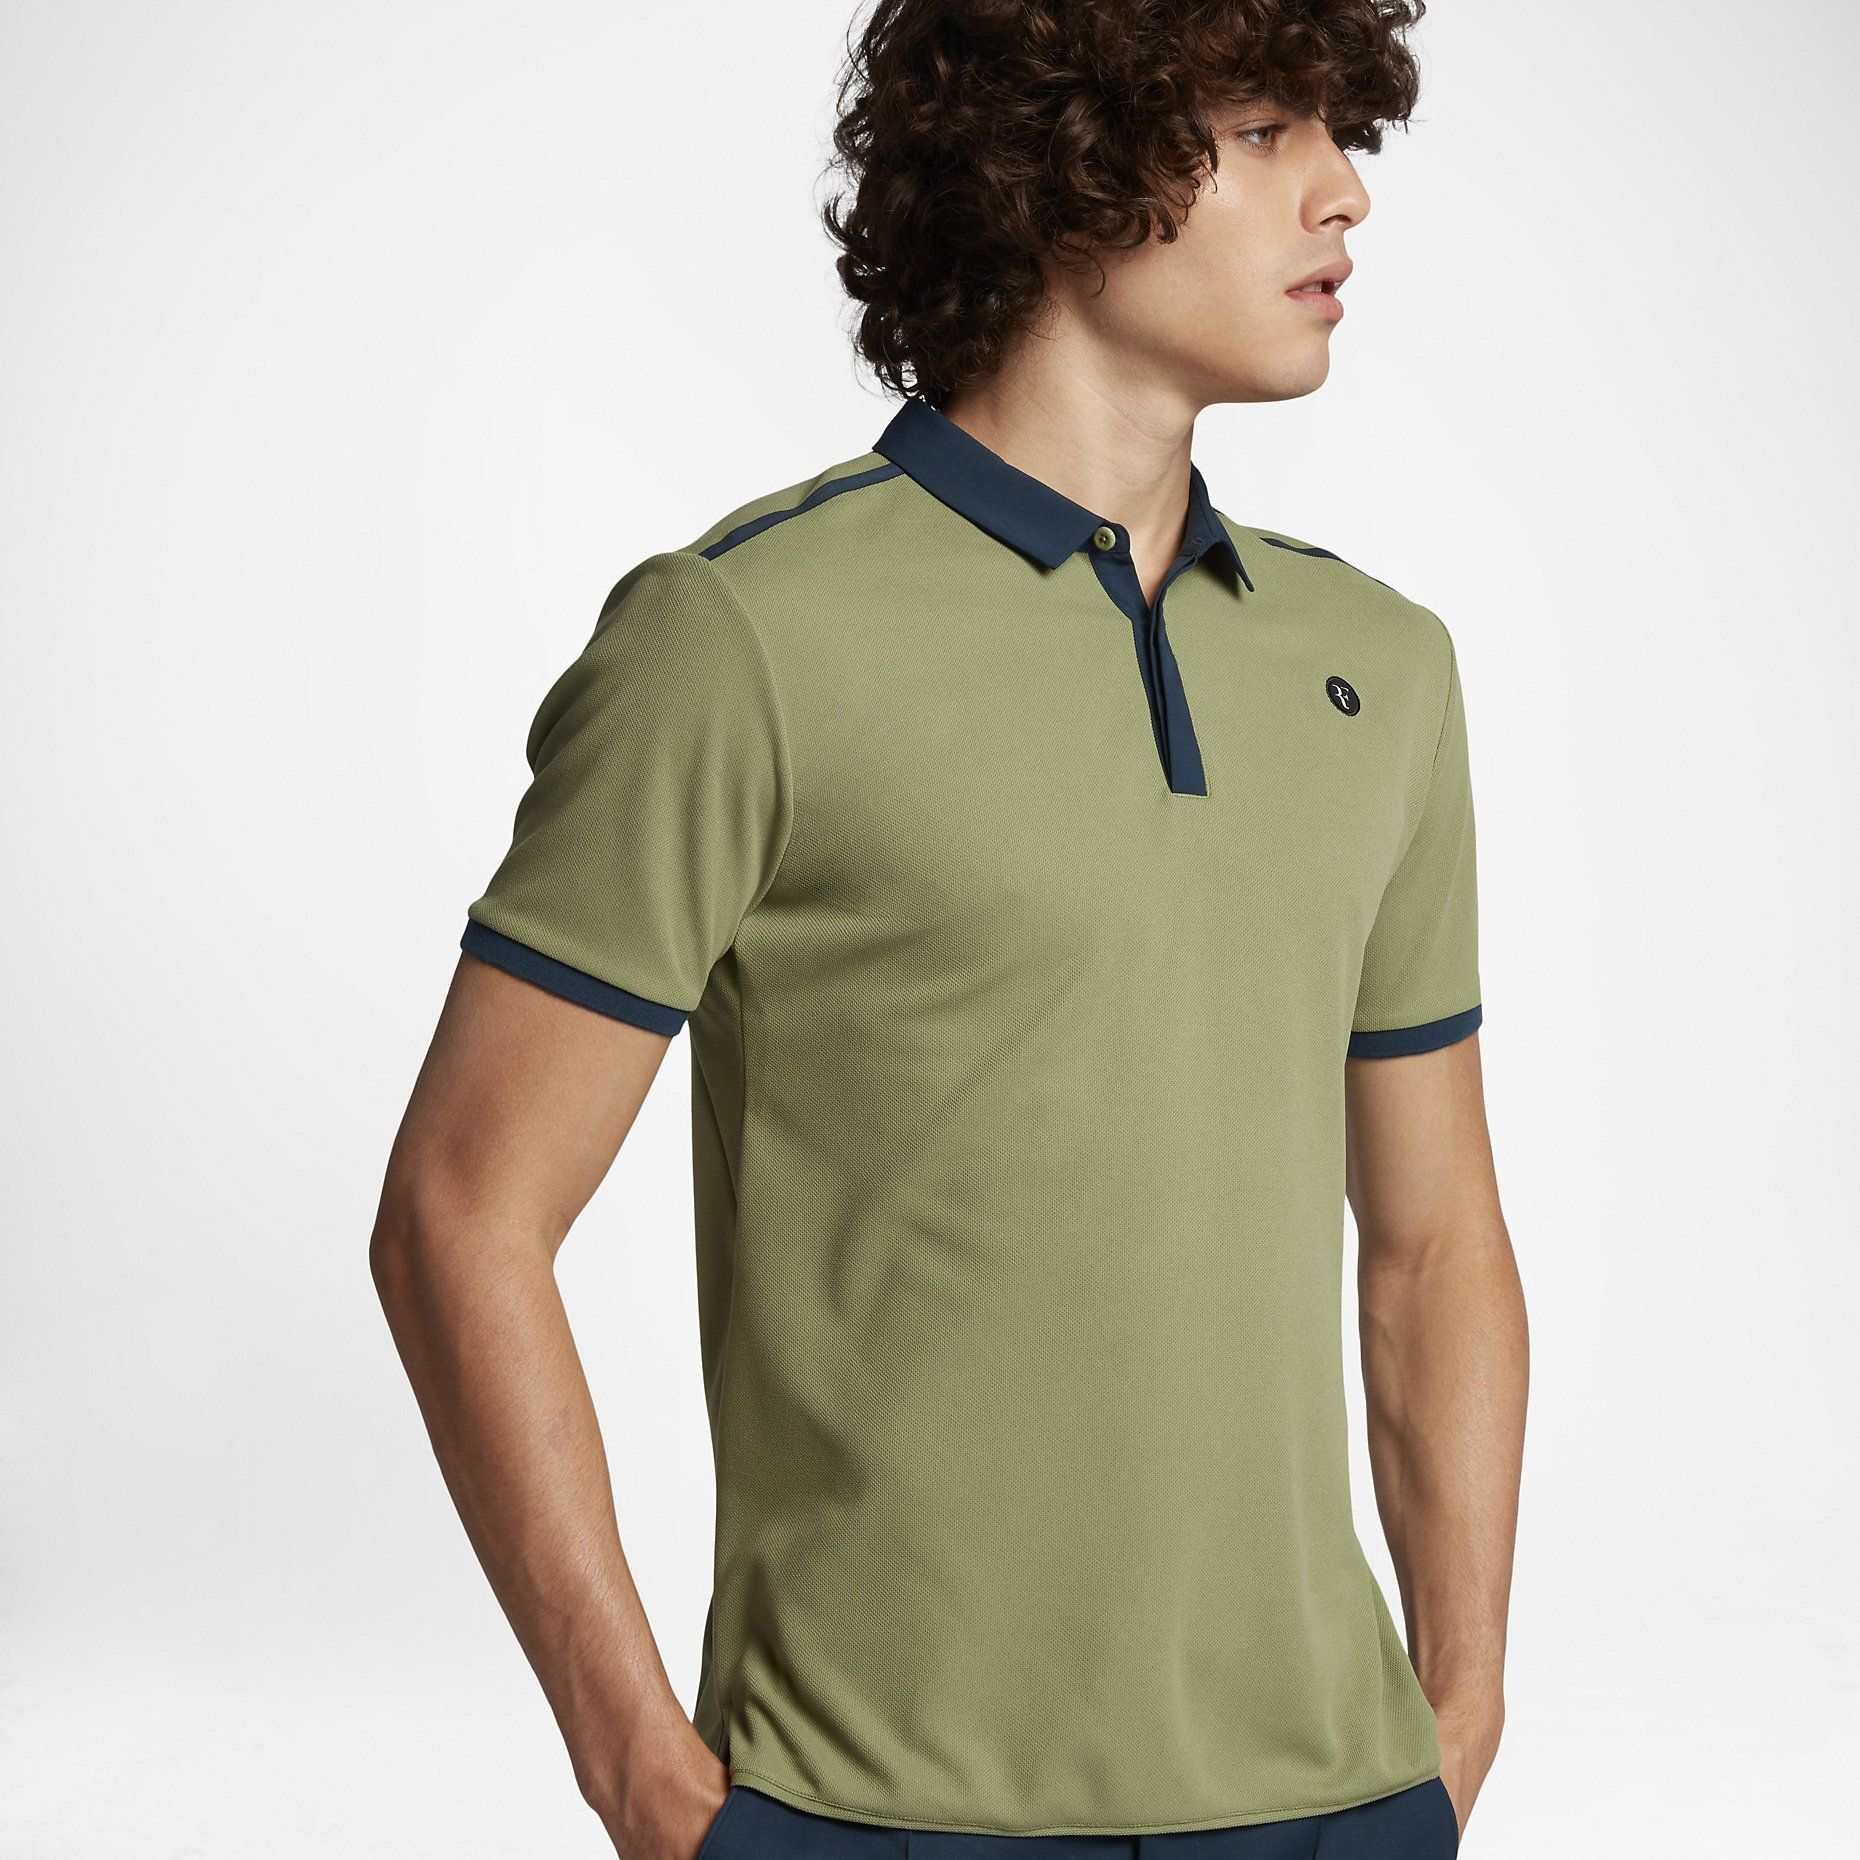 9d1358ed NIKECOURT X RF POLO T Shirt, Polo Shirt, Nike, Mens Tops, Clothes